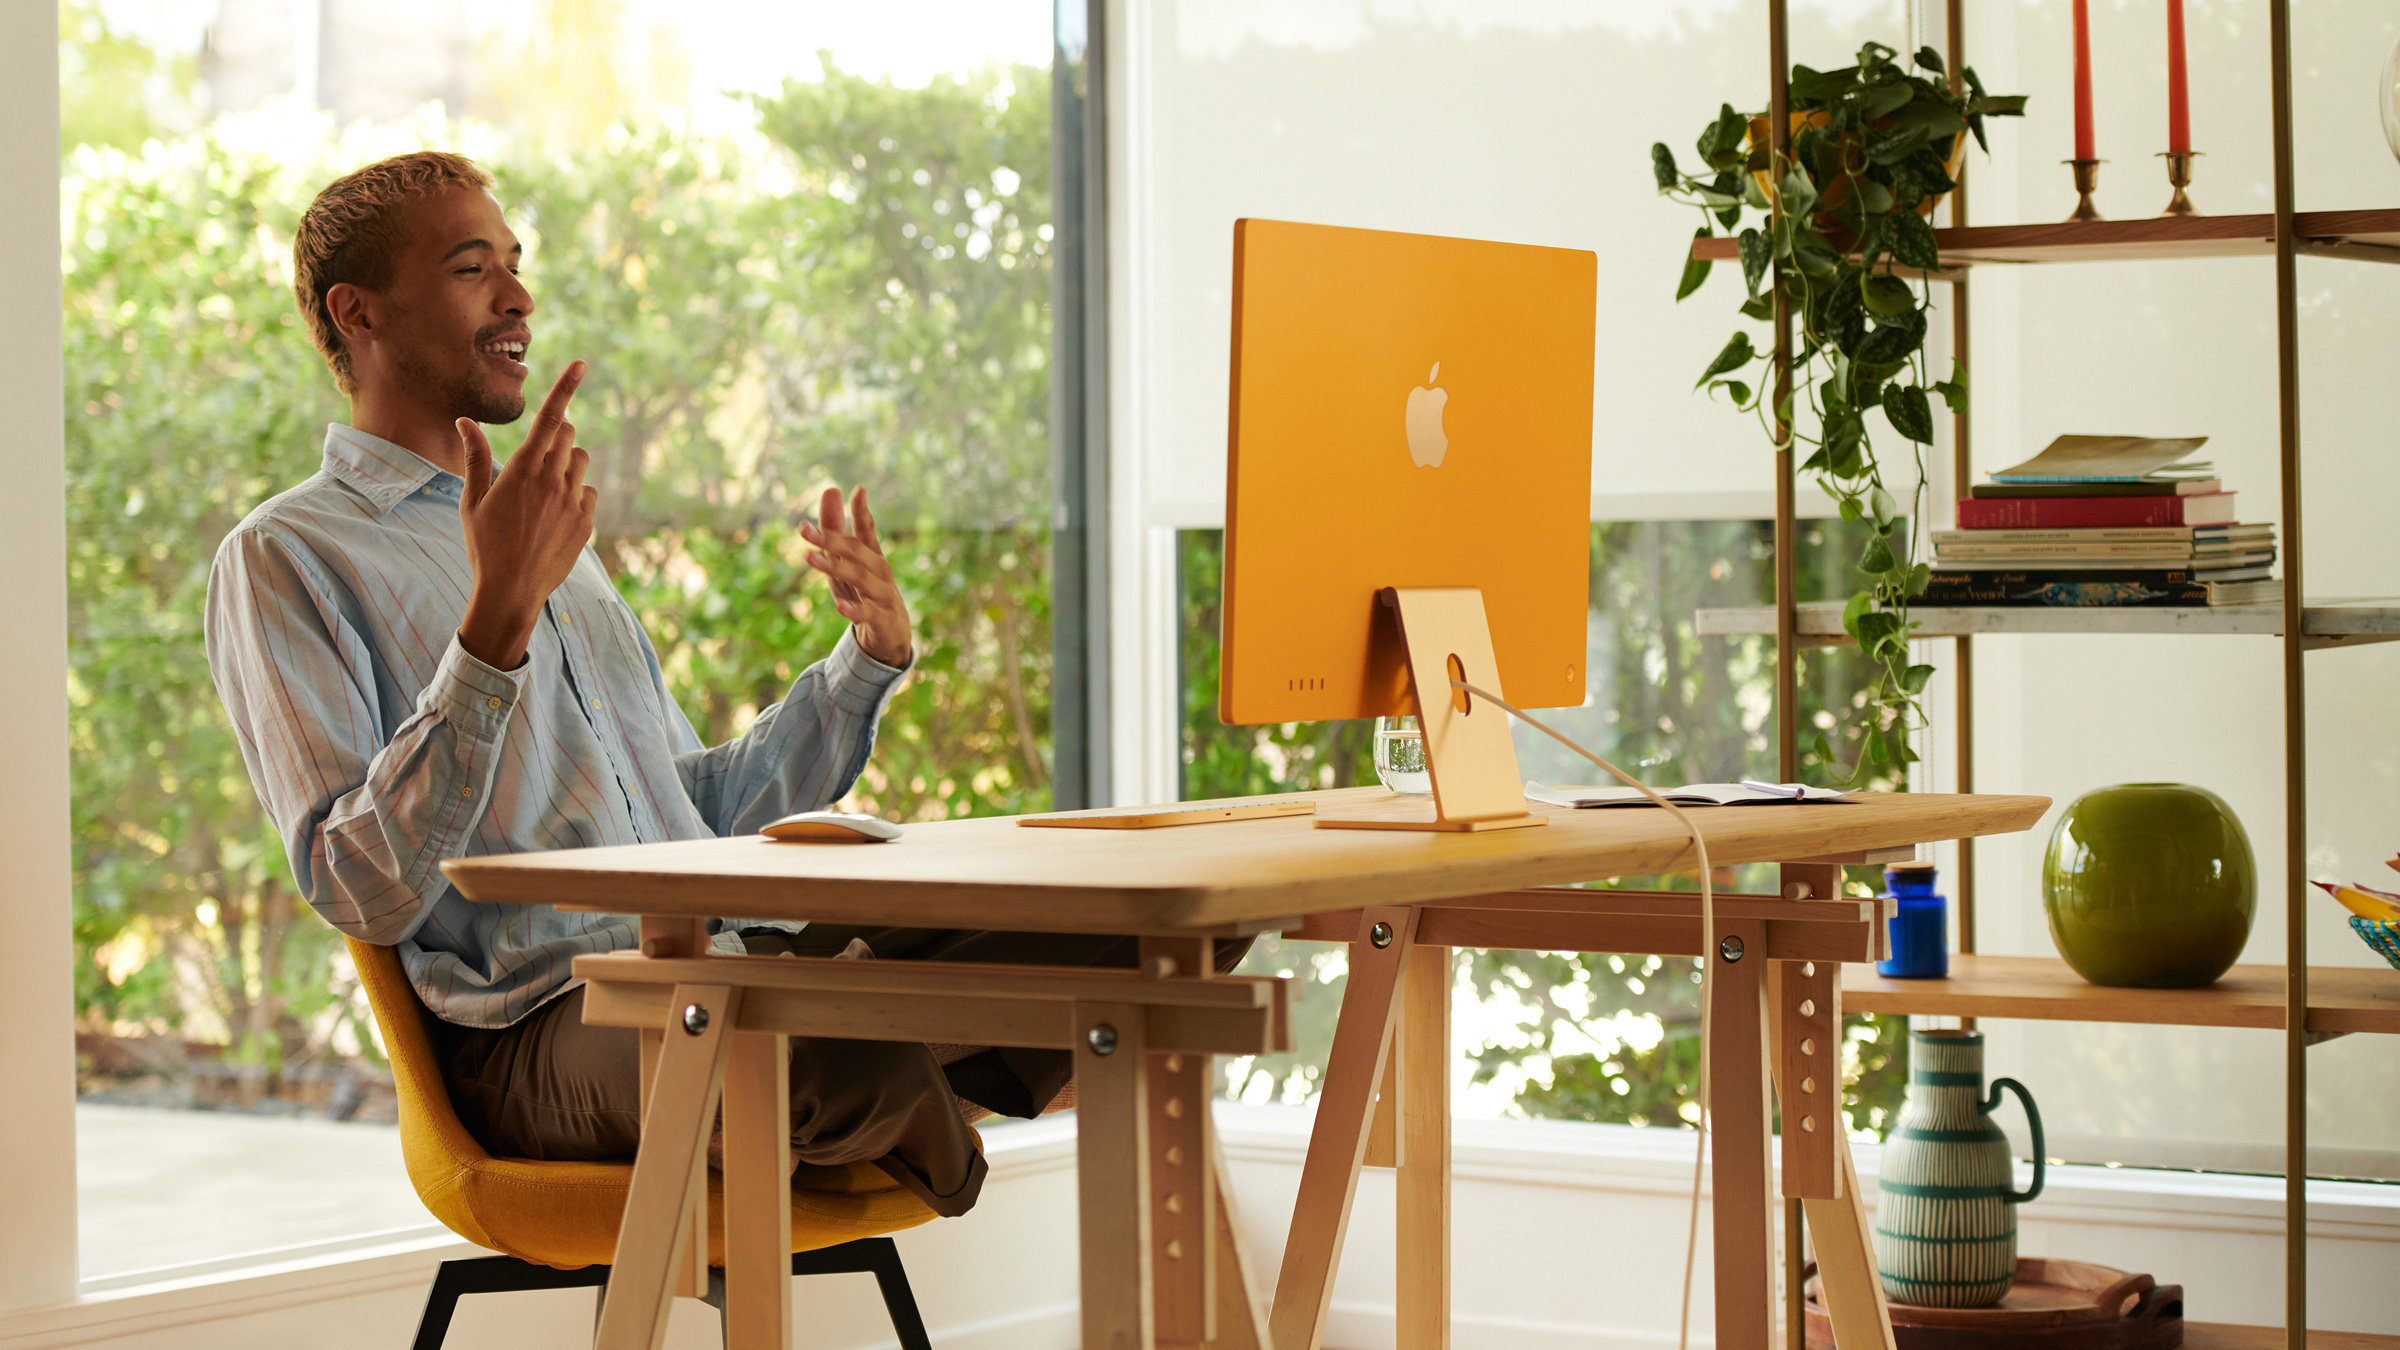 The new 24-inch iMac (2021) vs. the M1 Mac Mini (2020)